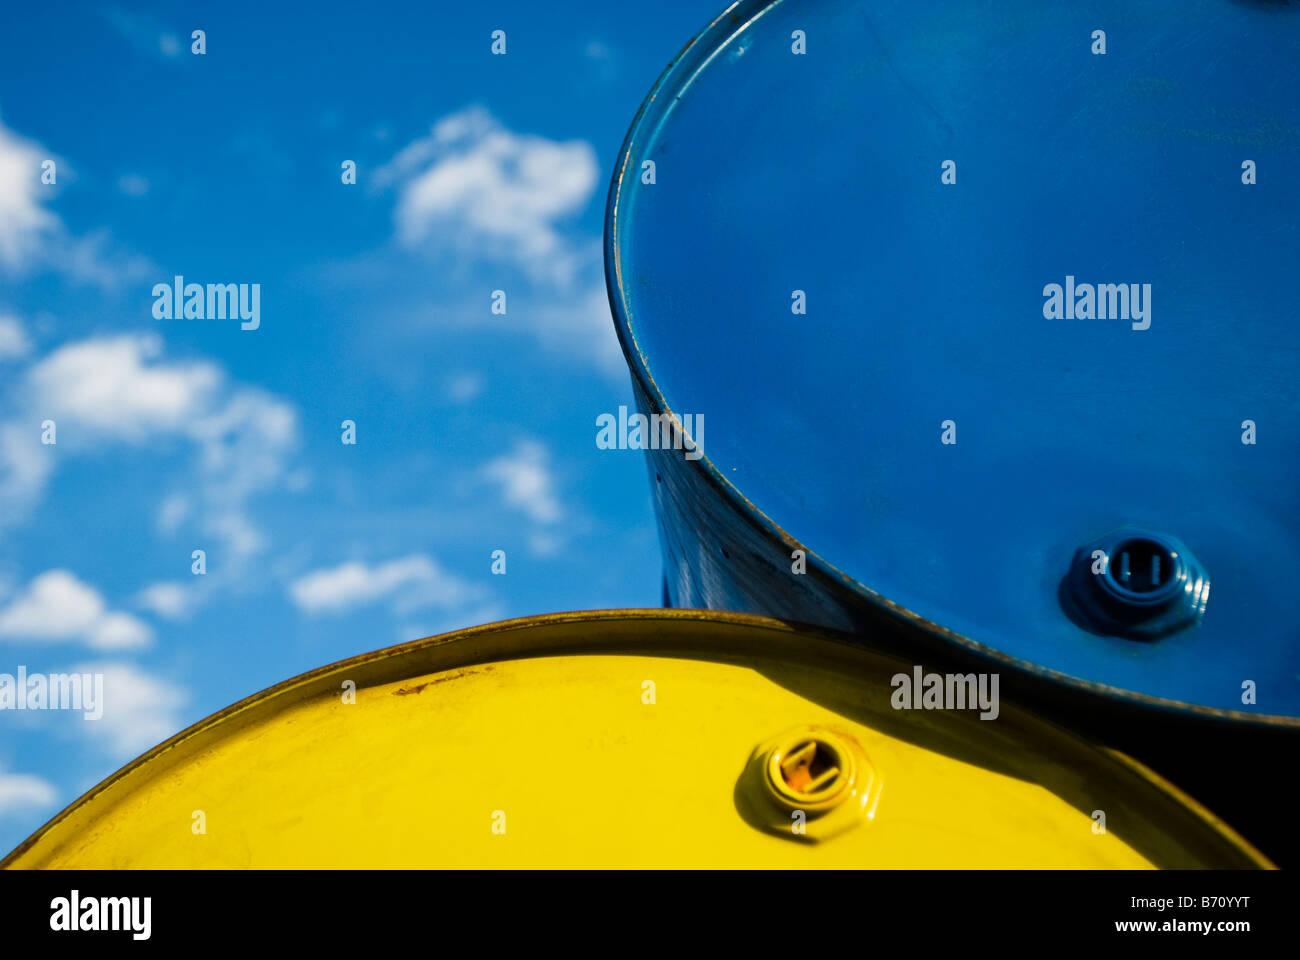 55 Gallon Drum Stock Photos & 55 Gallon Drum Stock Images